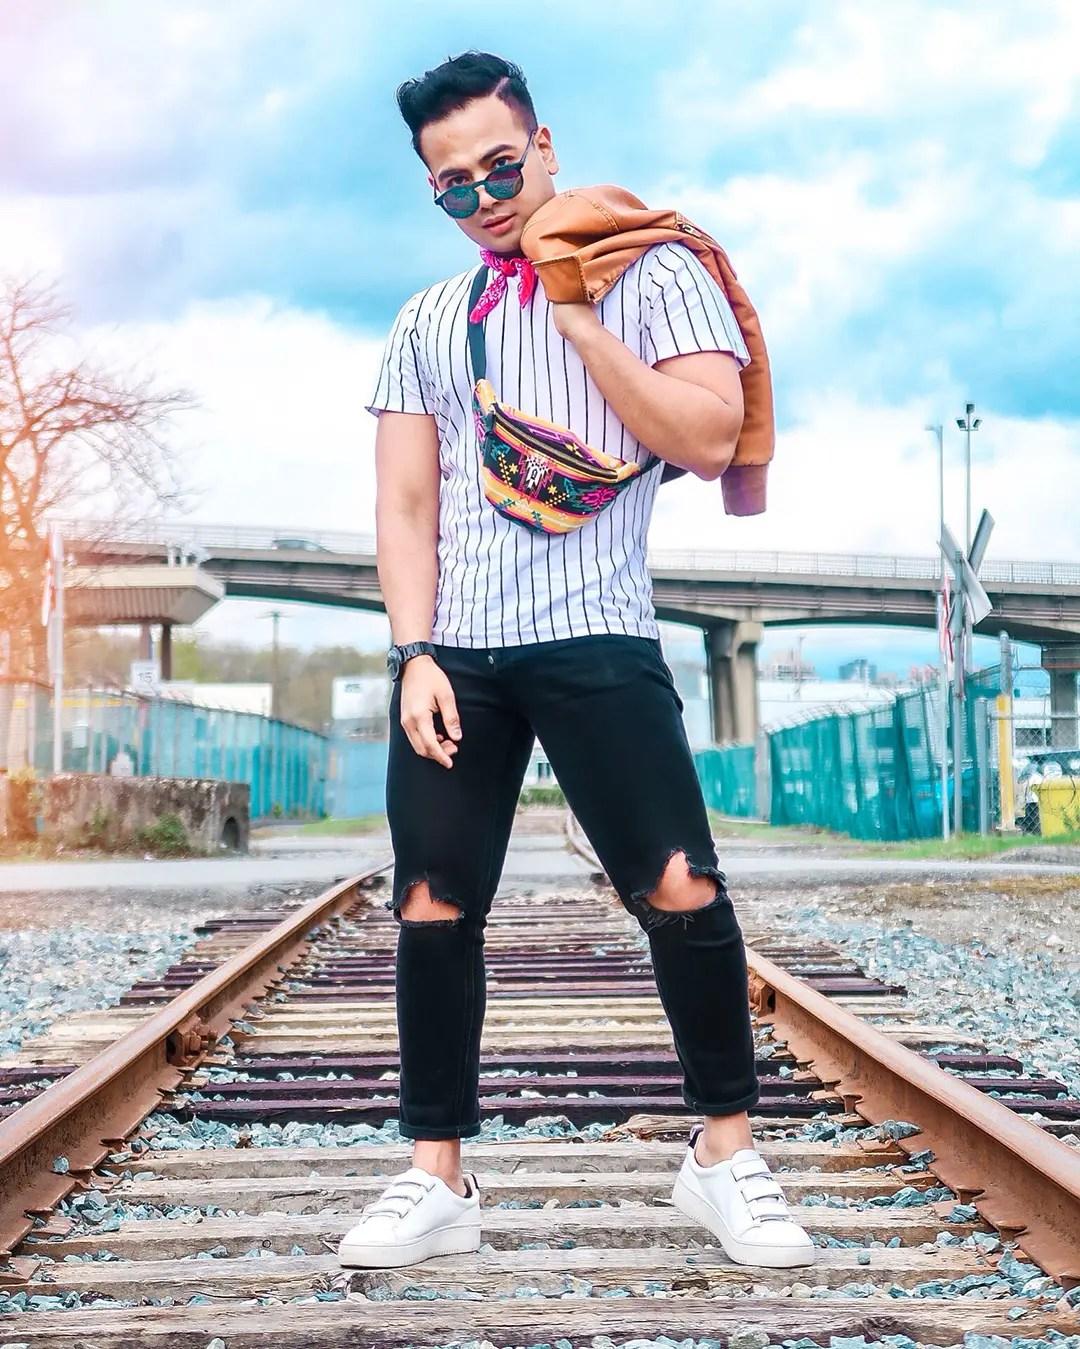 Jonathan Waiching Ho Travel Blogger Influencer Summer fashion men Canada Social Media Influencer Biker jacket denims Toronto Influencer Fashion Canada Blogs